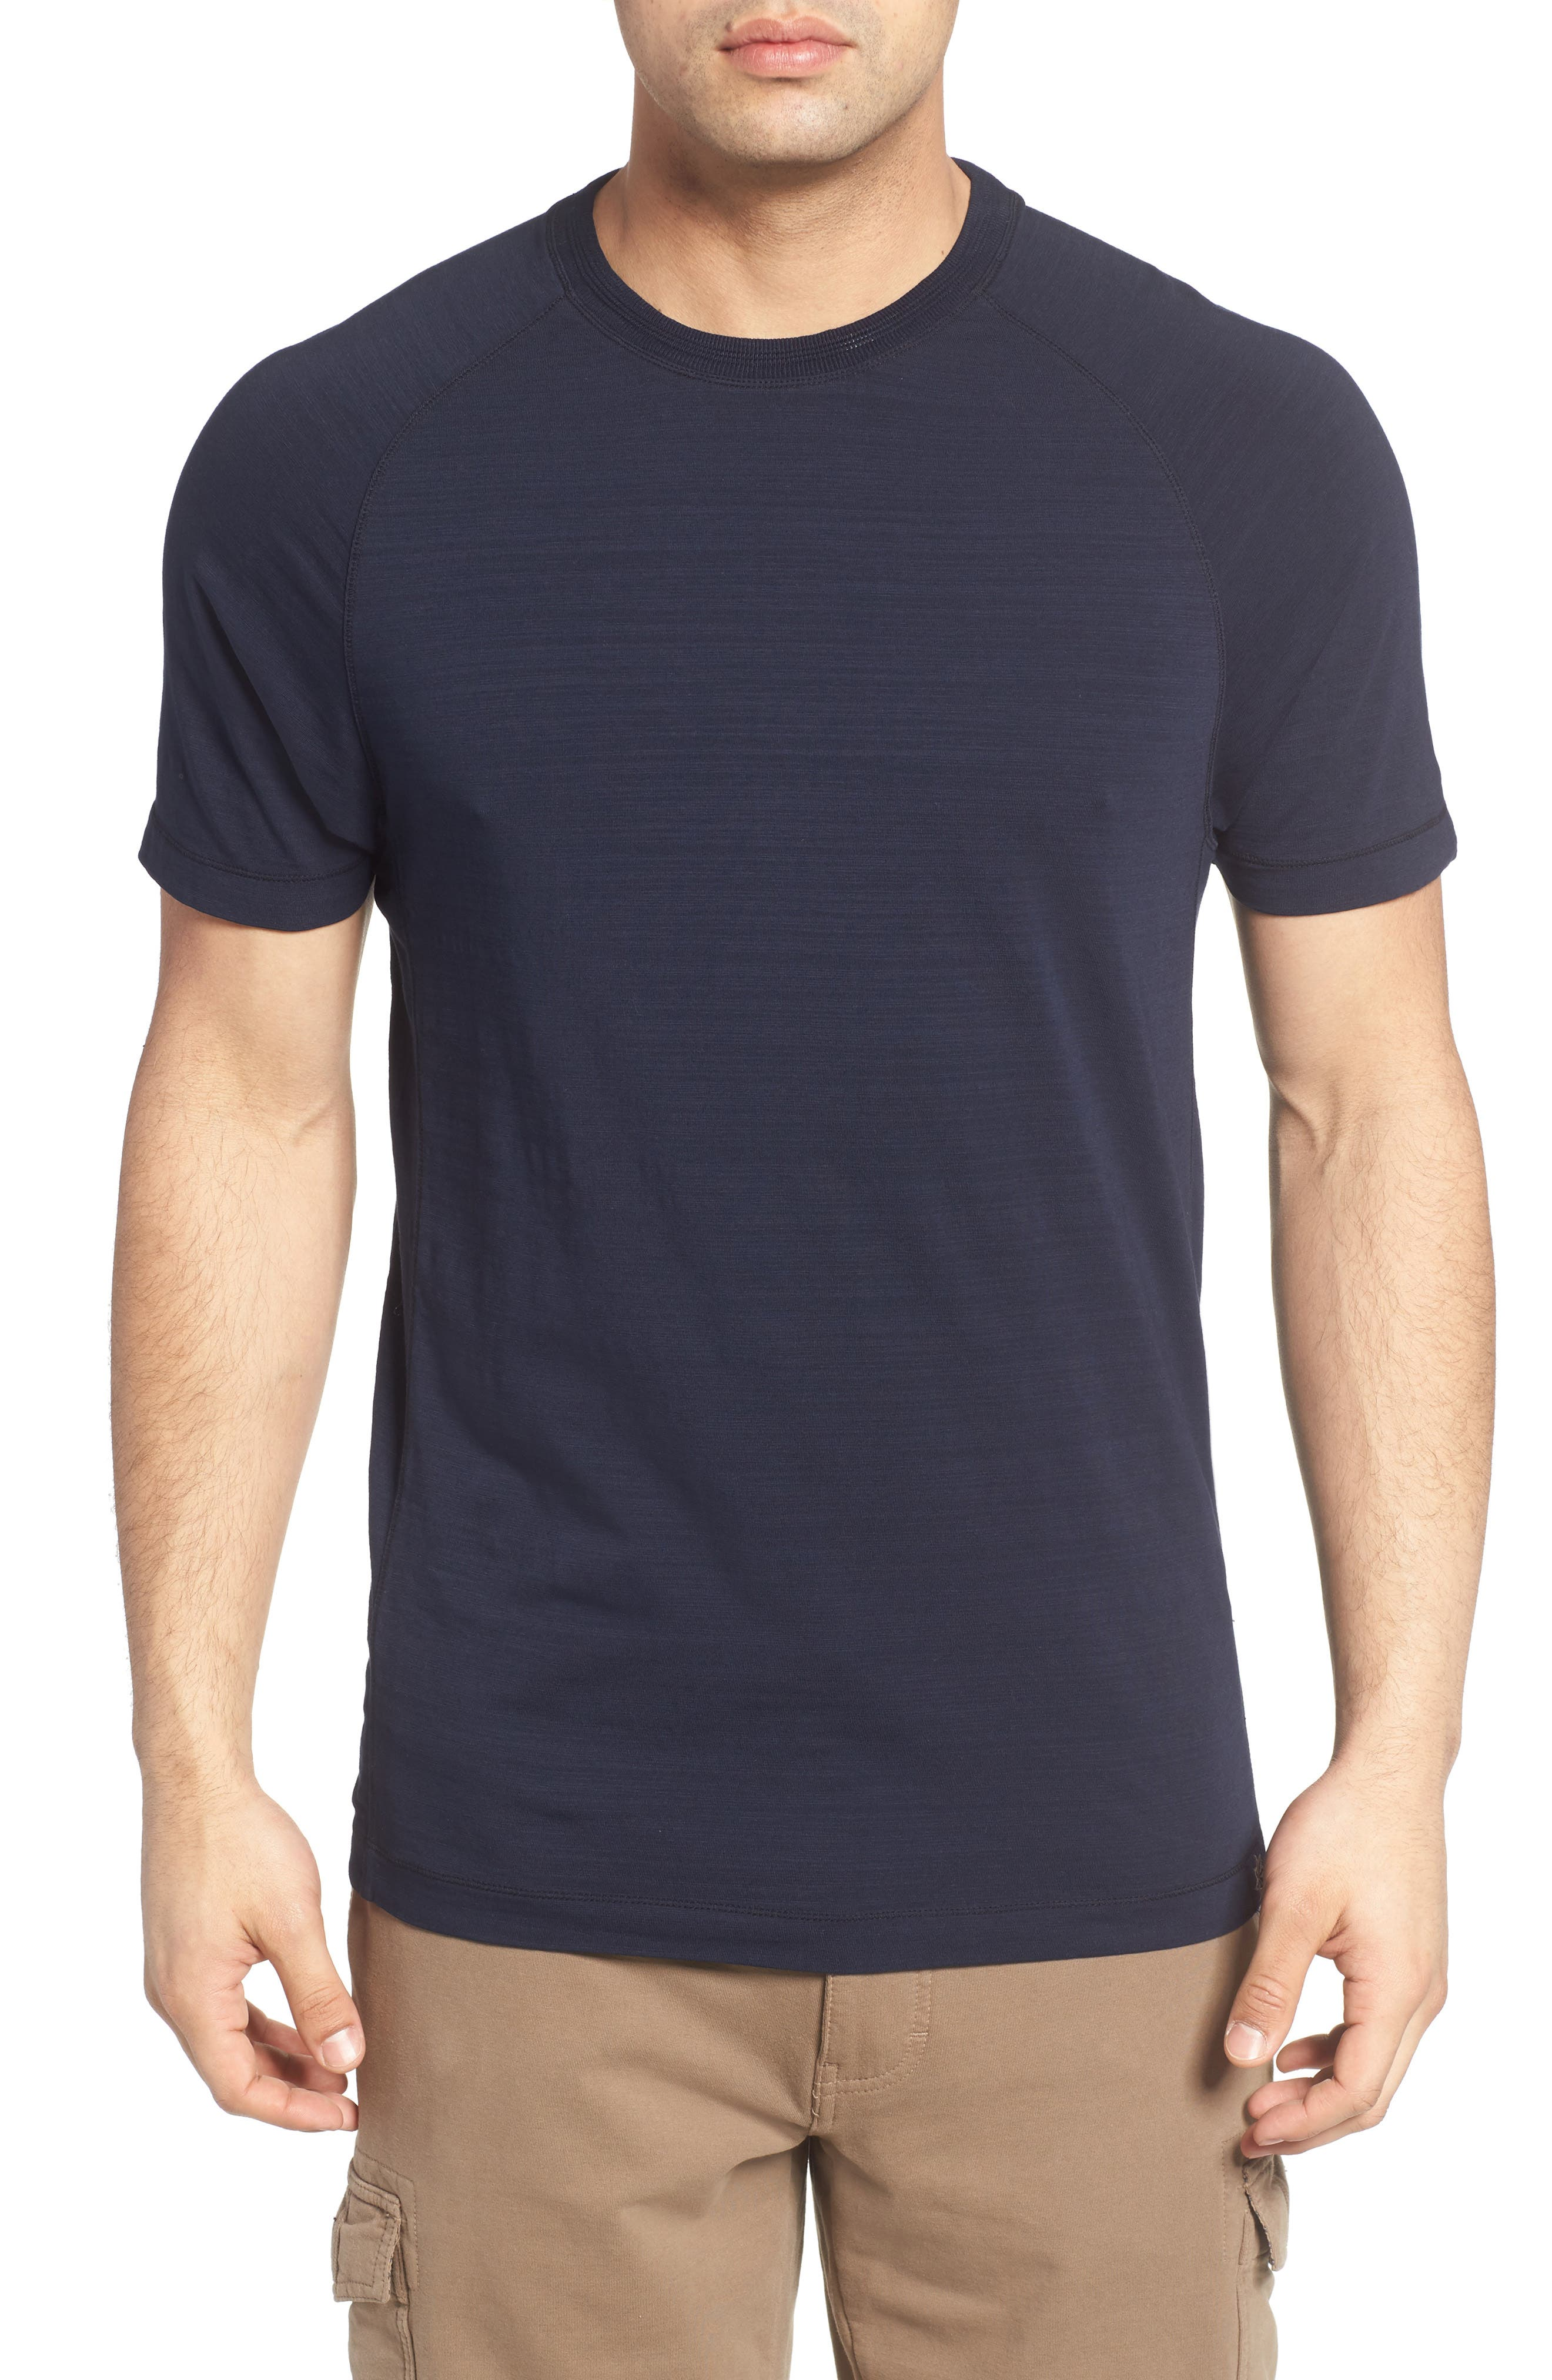 Alternate Image 1 Selected - Thaddeus Riggs Stretch Slub Jersey T-Shirt